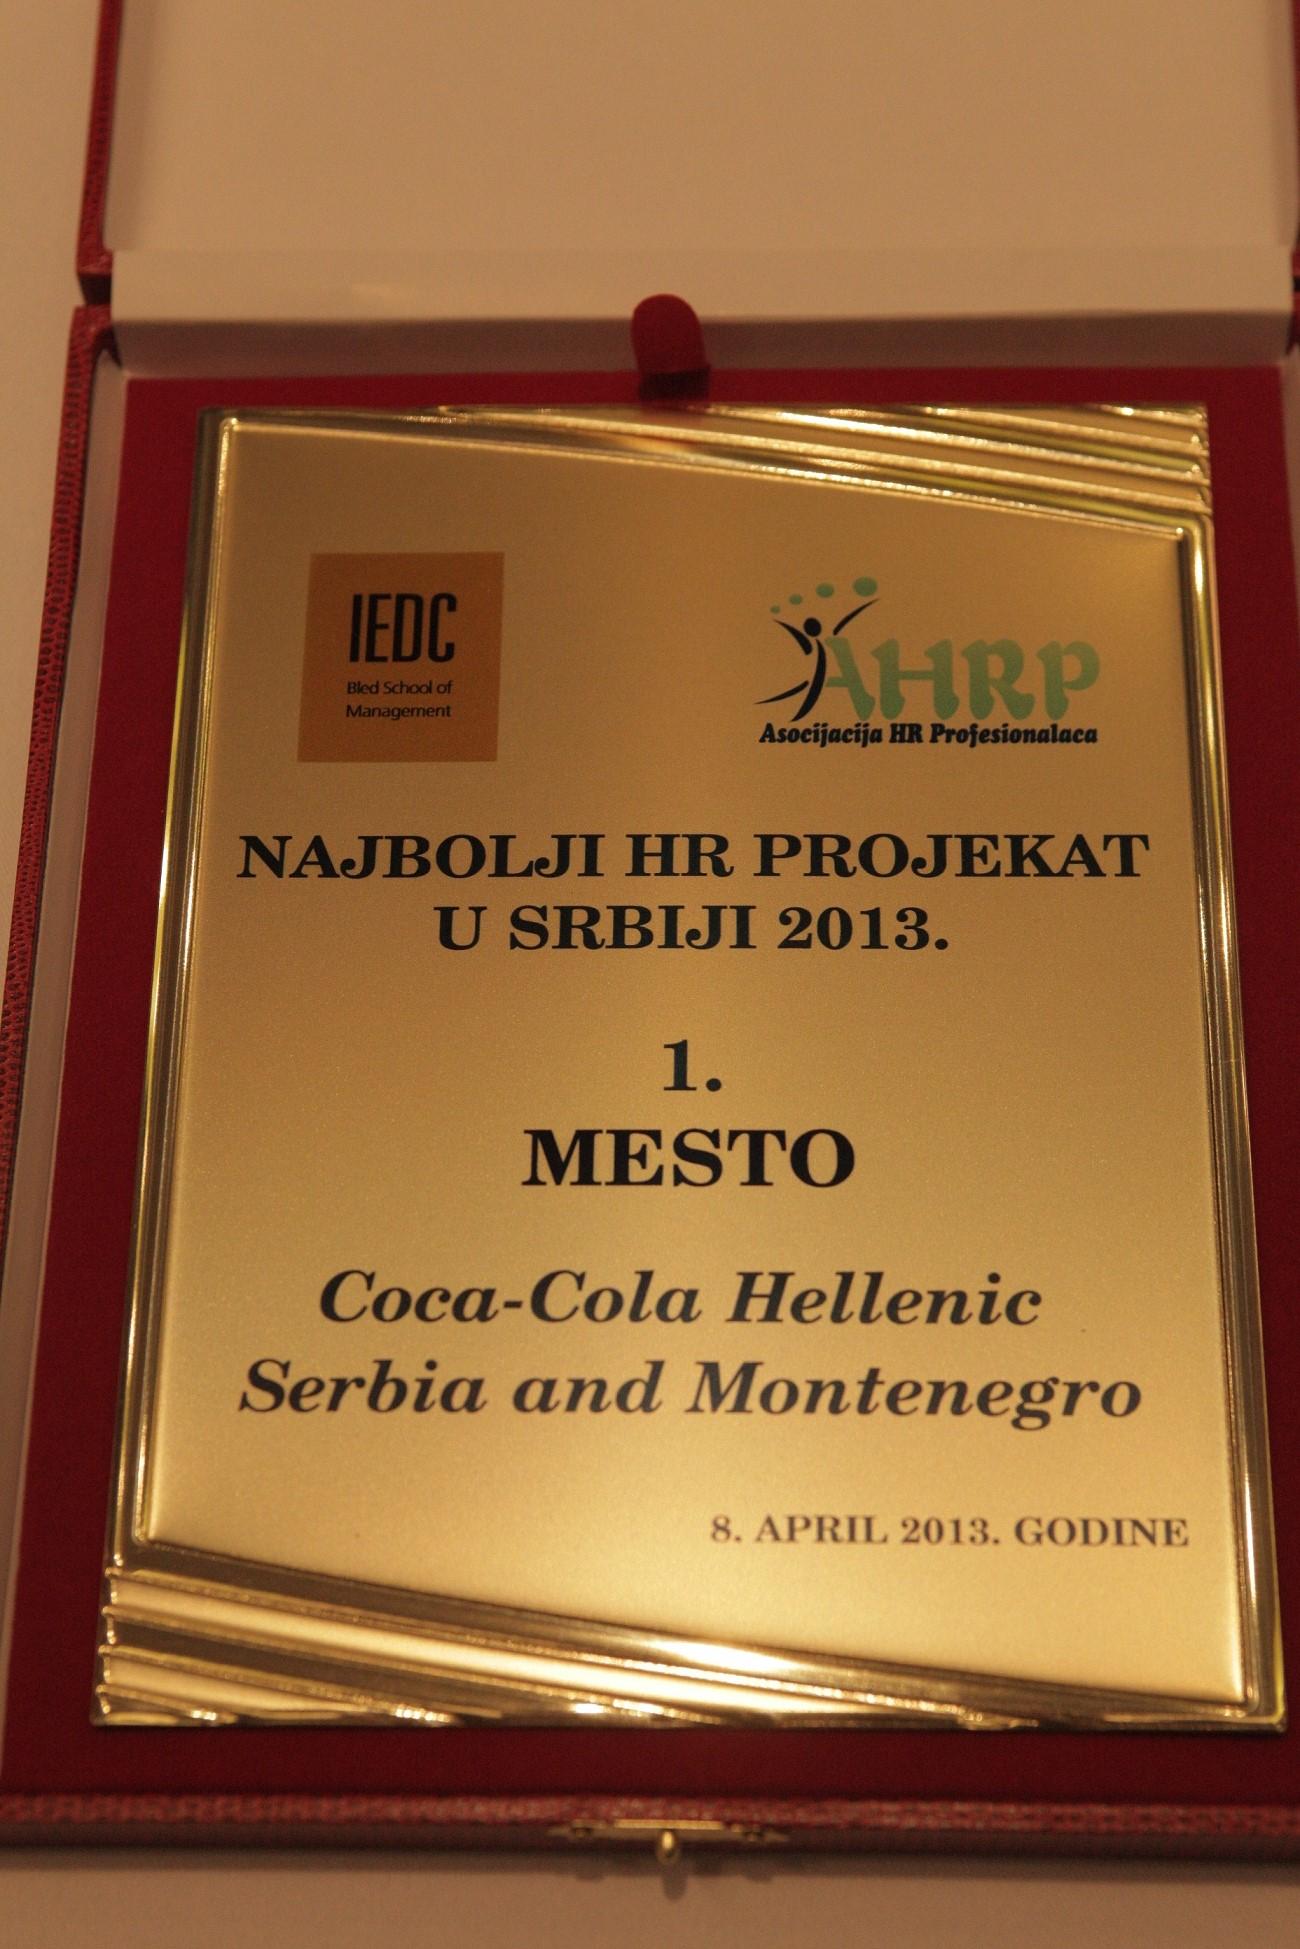 prva nagrada za najbolji HR projekt